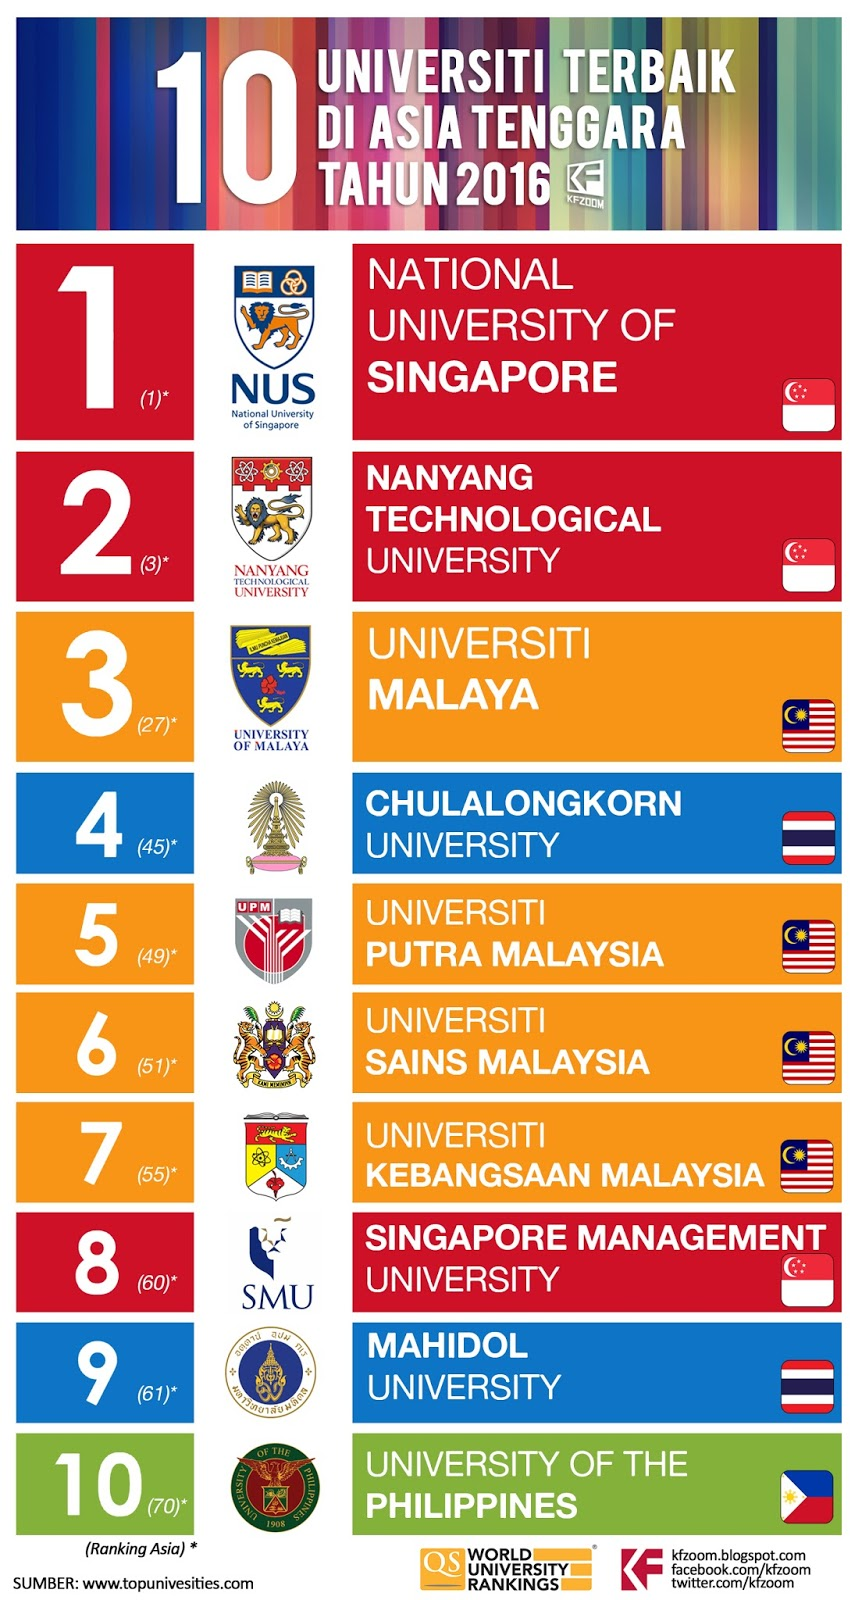 10 Universiti Terbaik Di Asia Asia Tenggara Malaysia Tahun 2016 Kfzoom